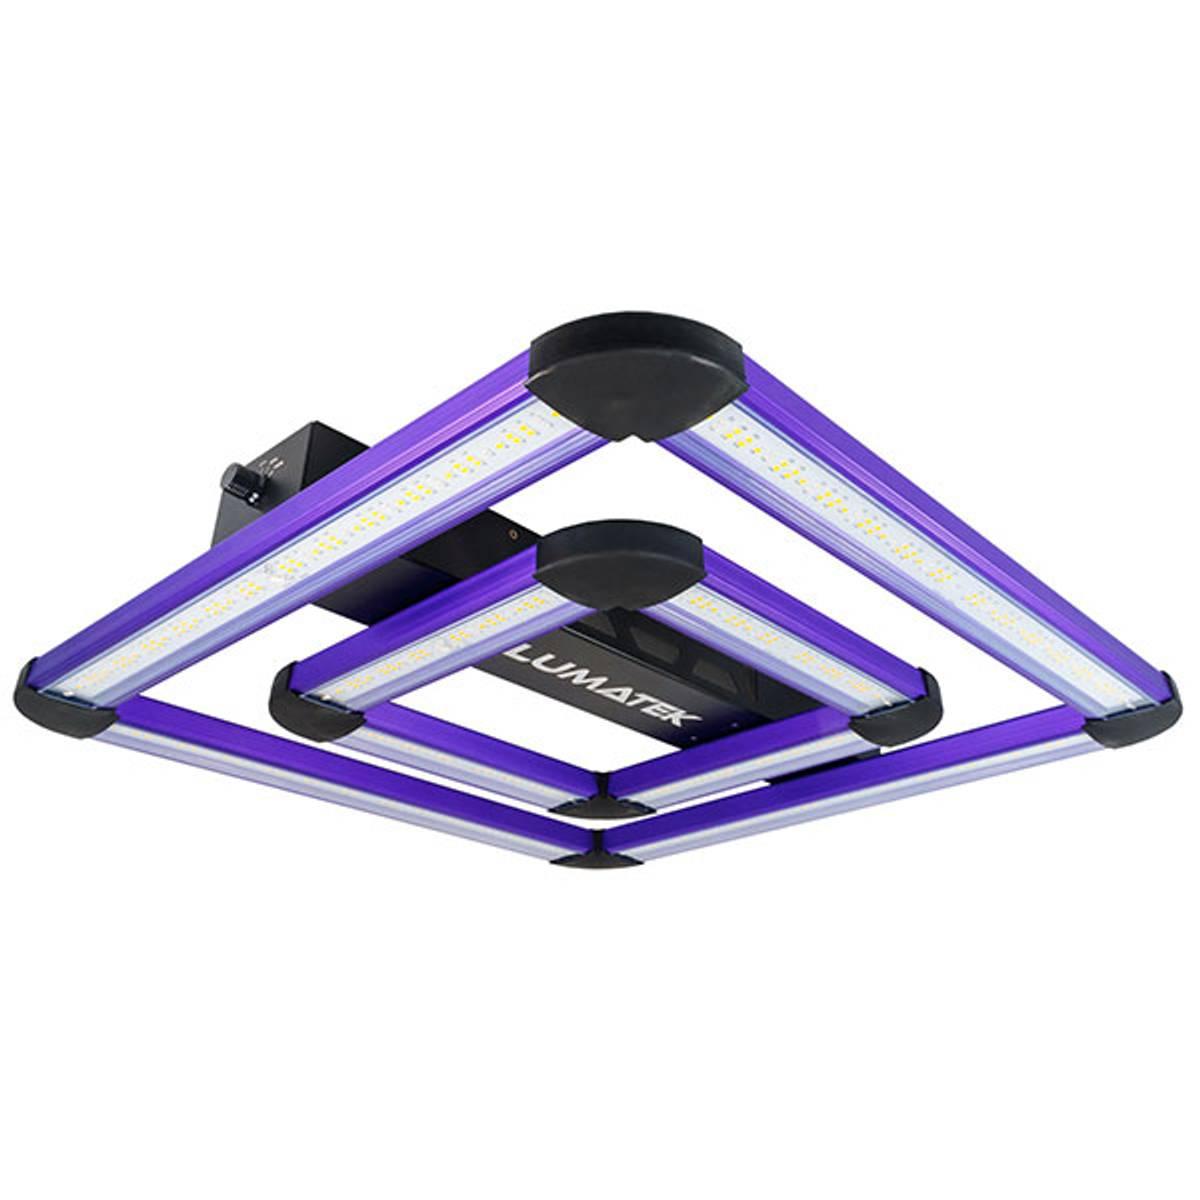 Lumatek Attis 200 W LED Fullspektrum